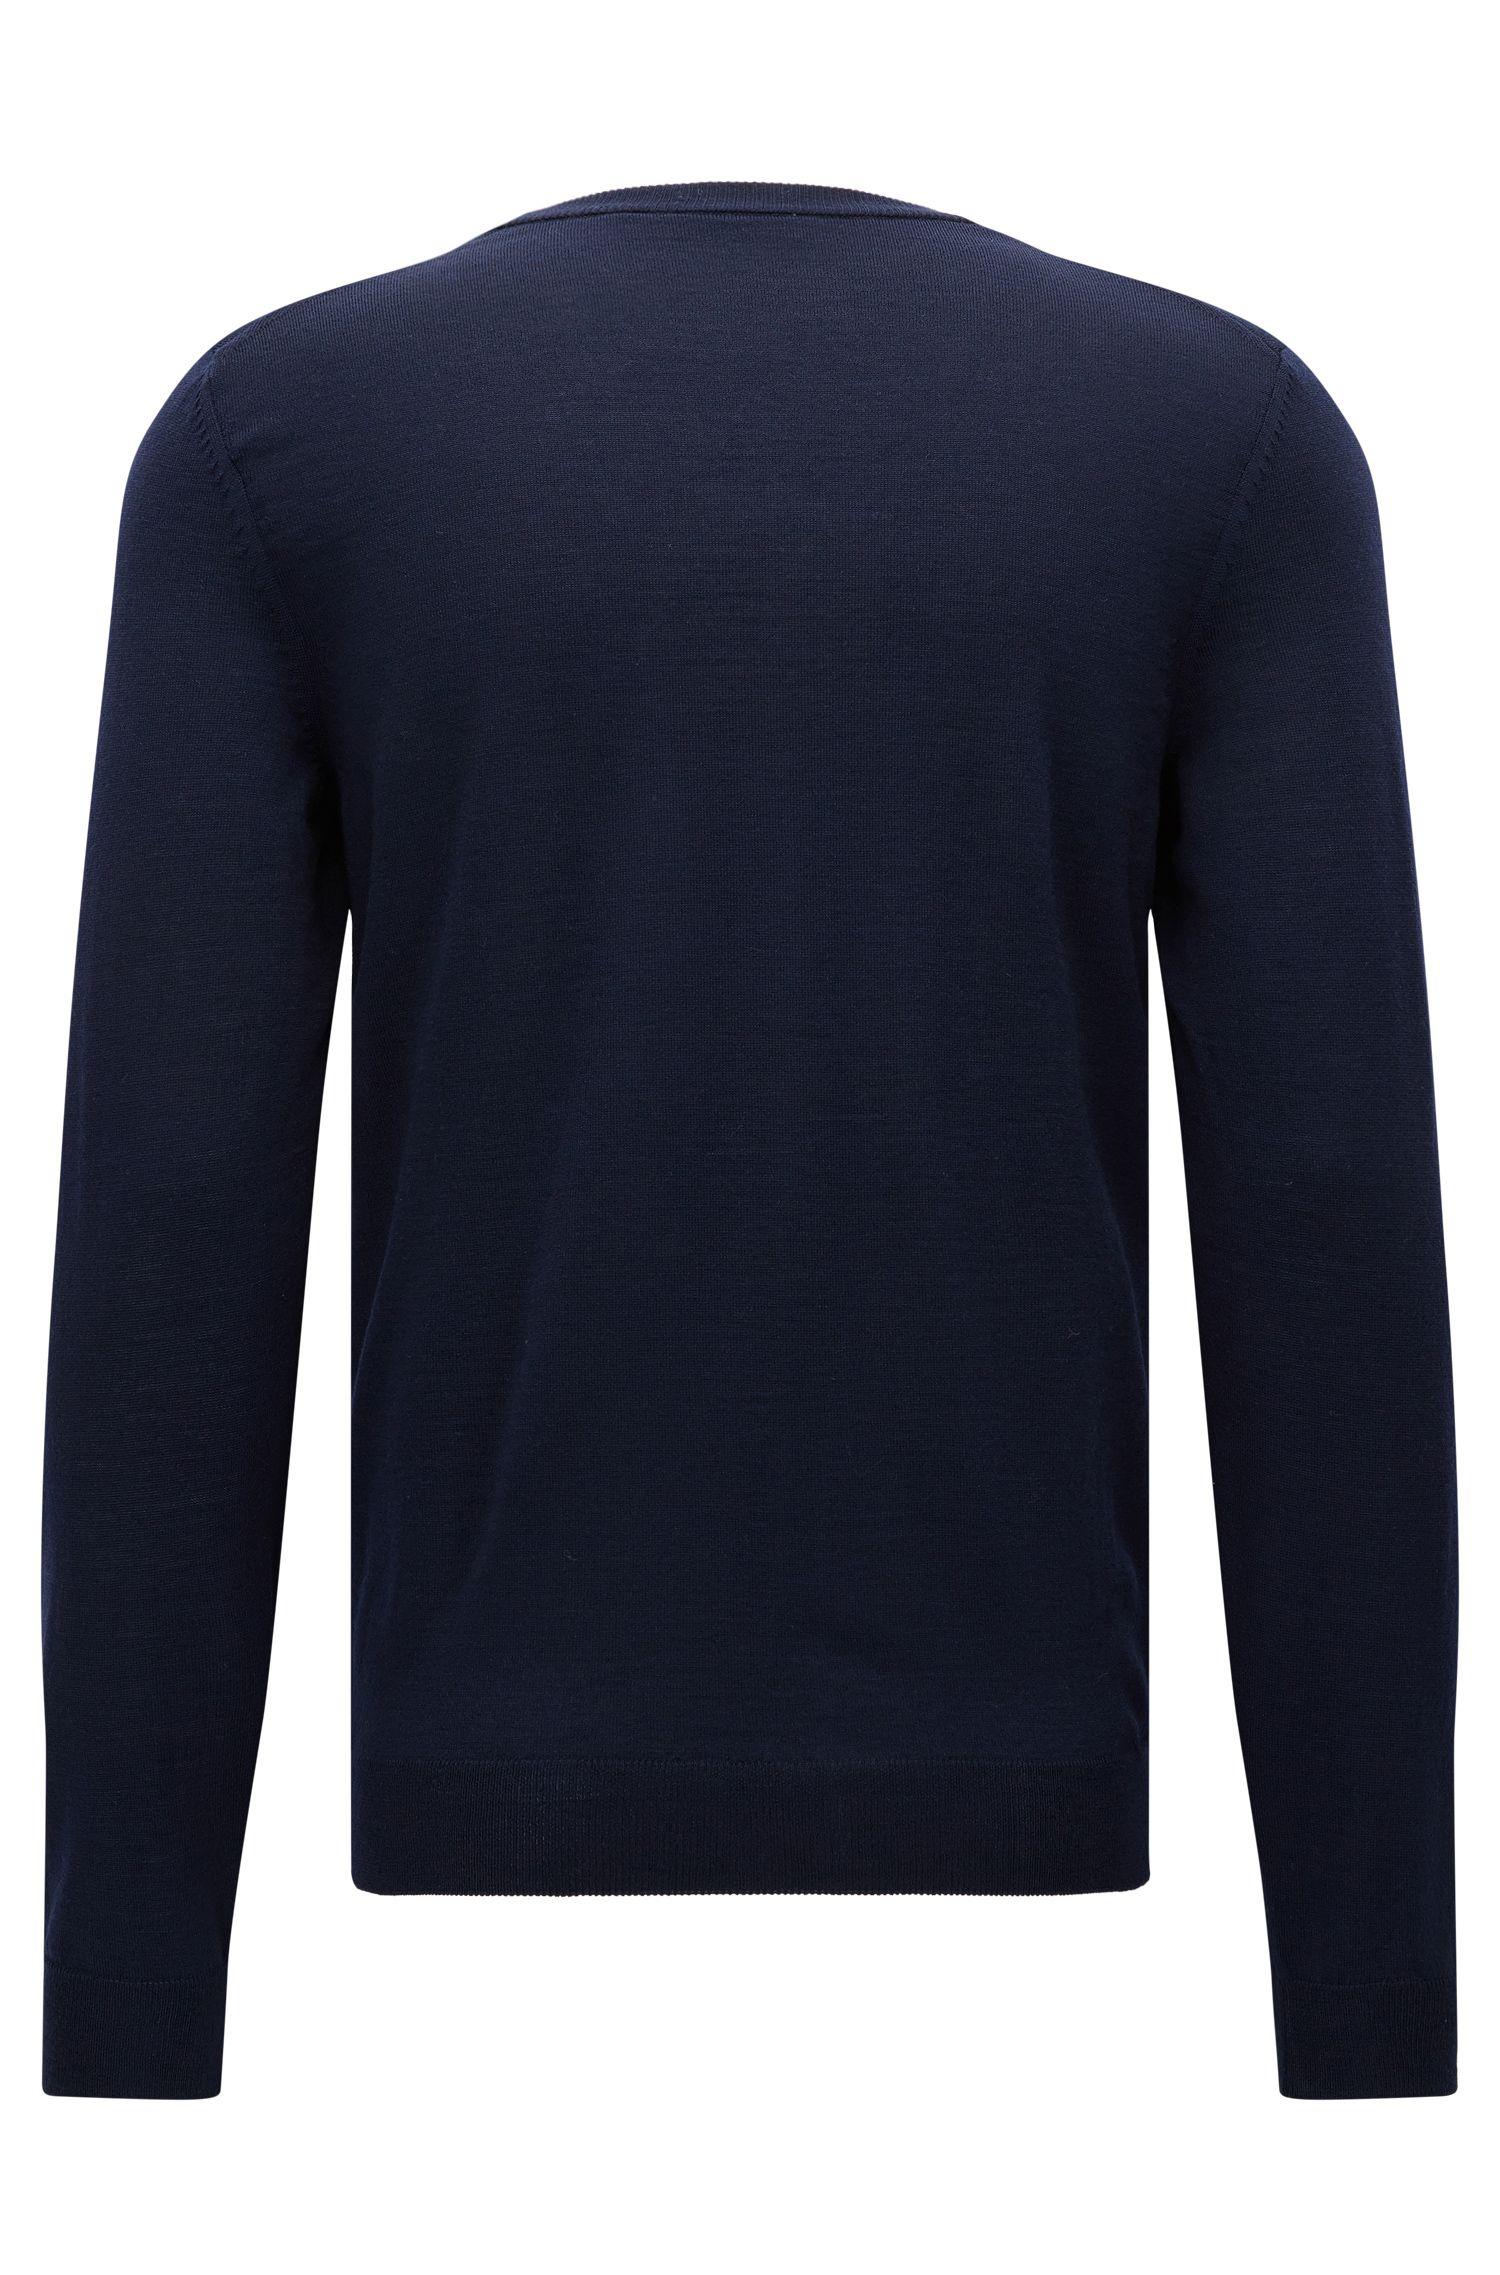 Extra-Fine Virgin Merino Wool Sweater, Slim FIt | Mardon M, Dark Blue